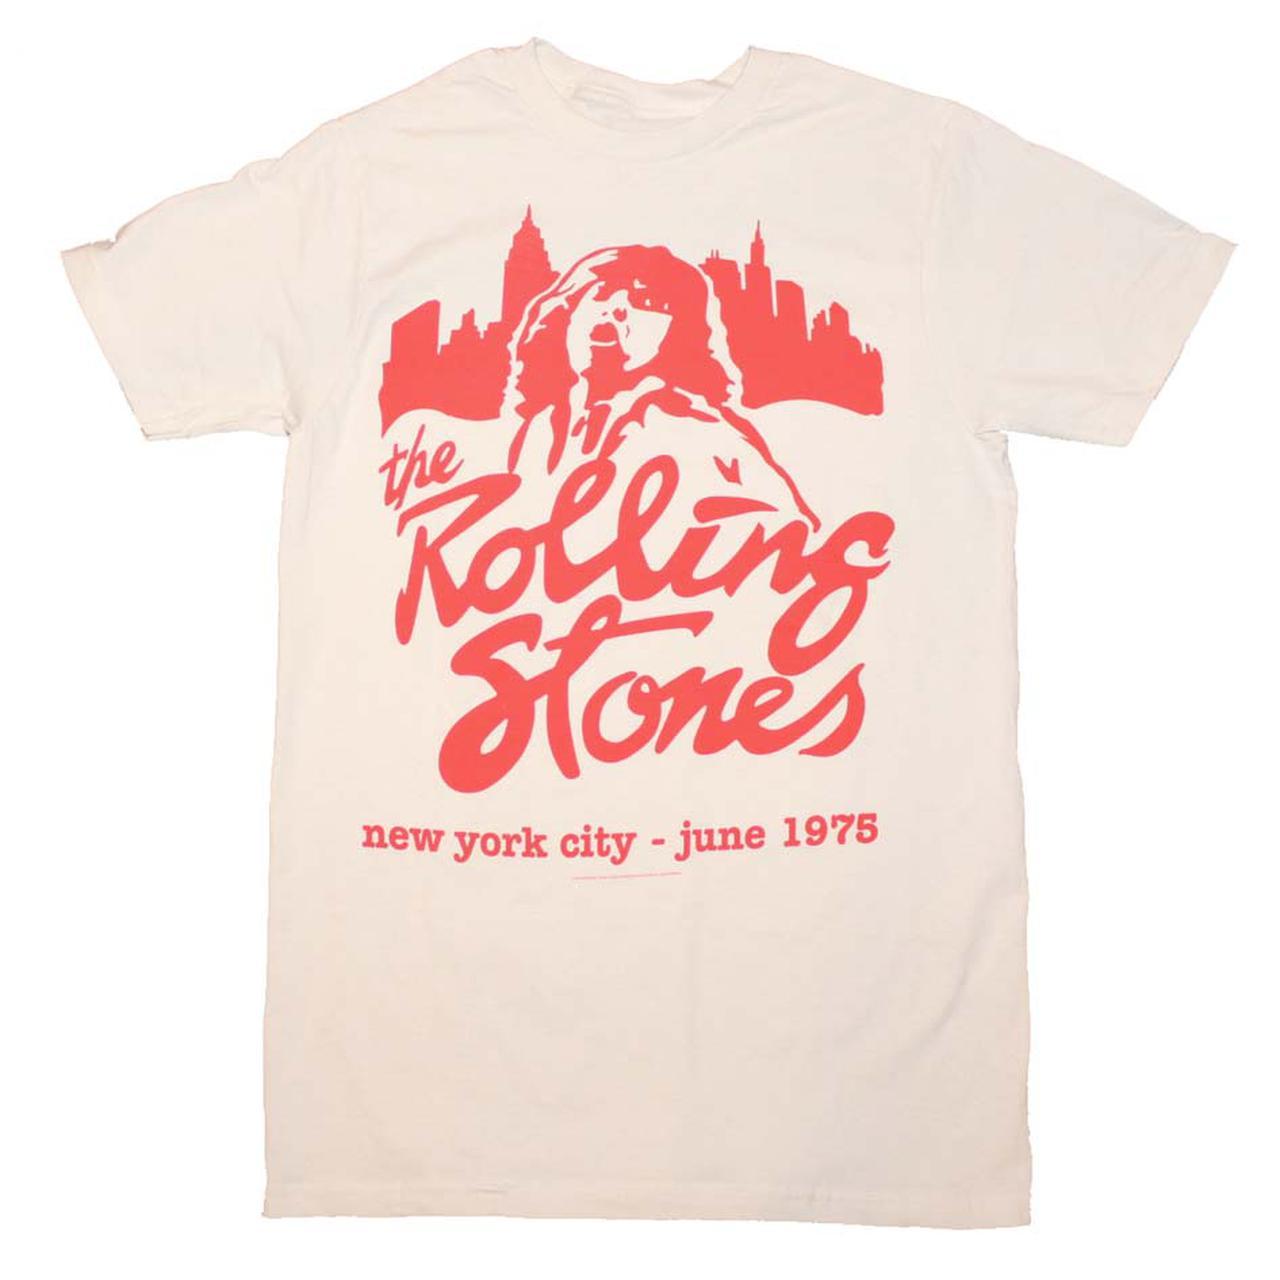 the rolling stones t shirt rolling stones mick june 1975. Black Bedroom Furniture Sets. Home Design Ideas